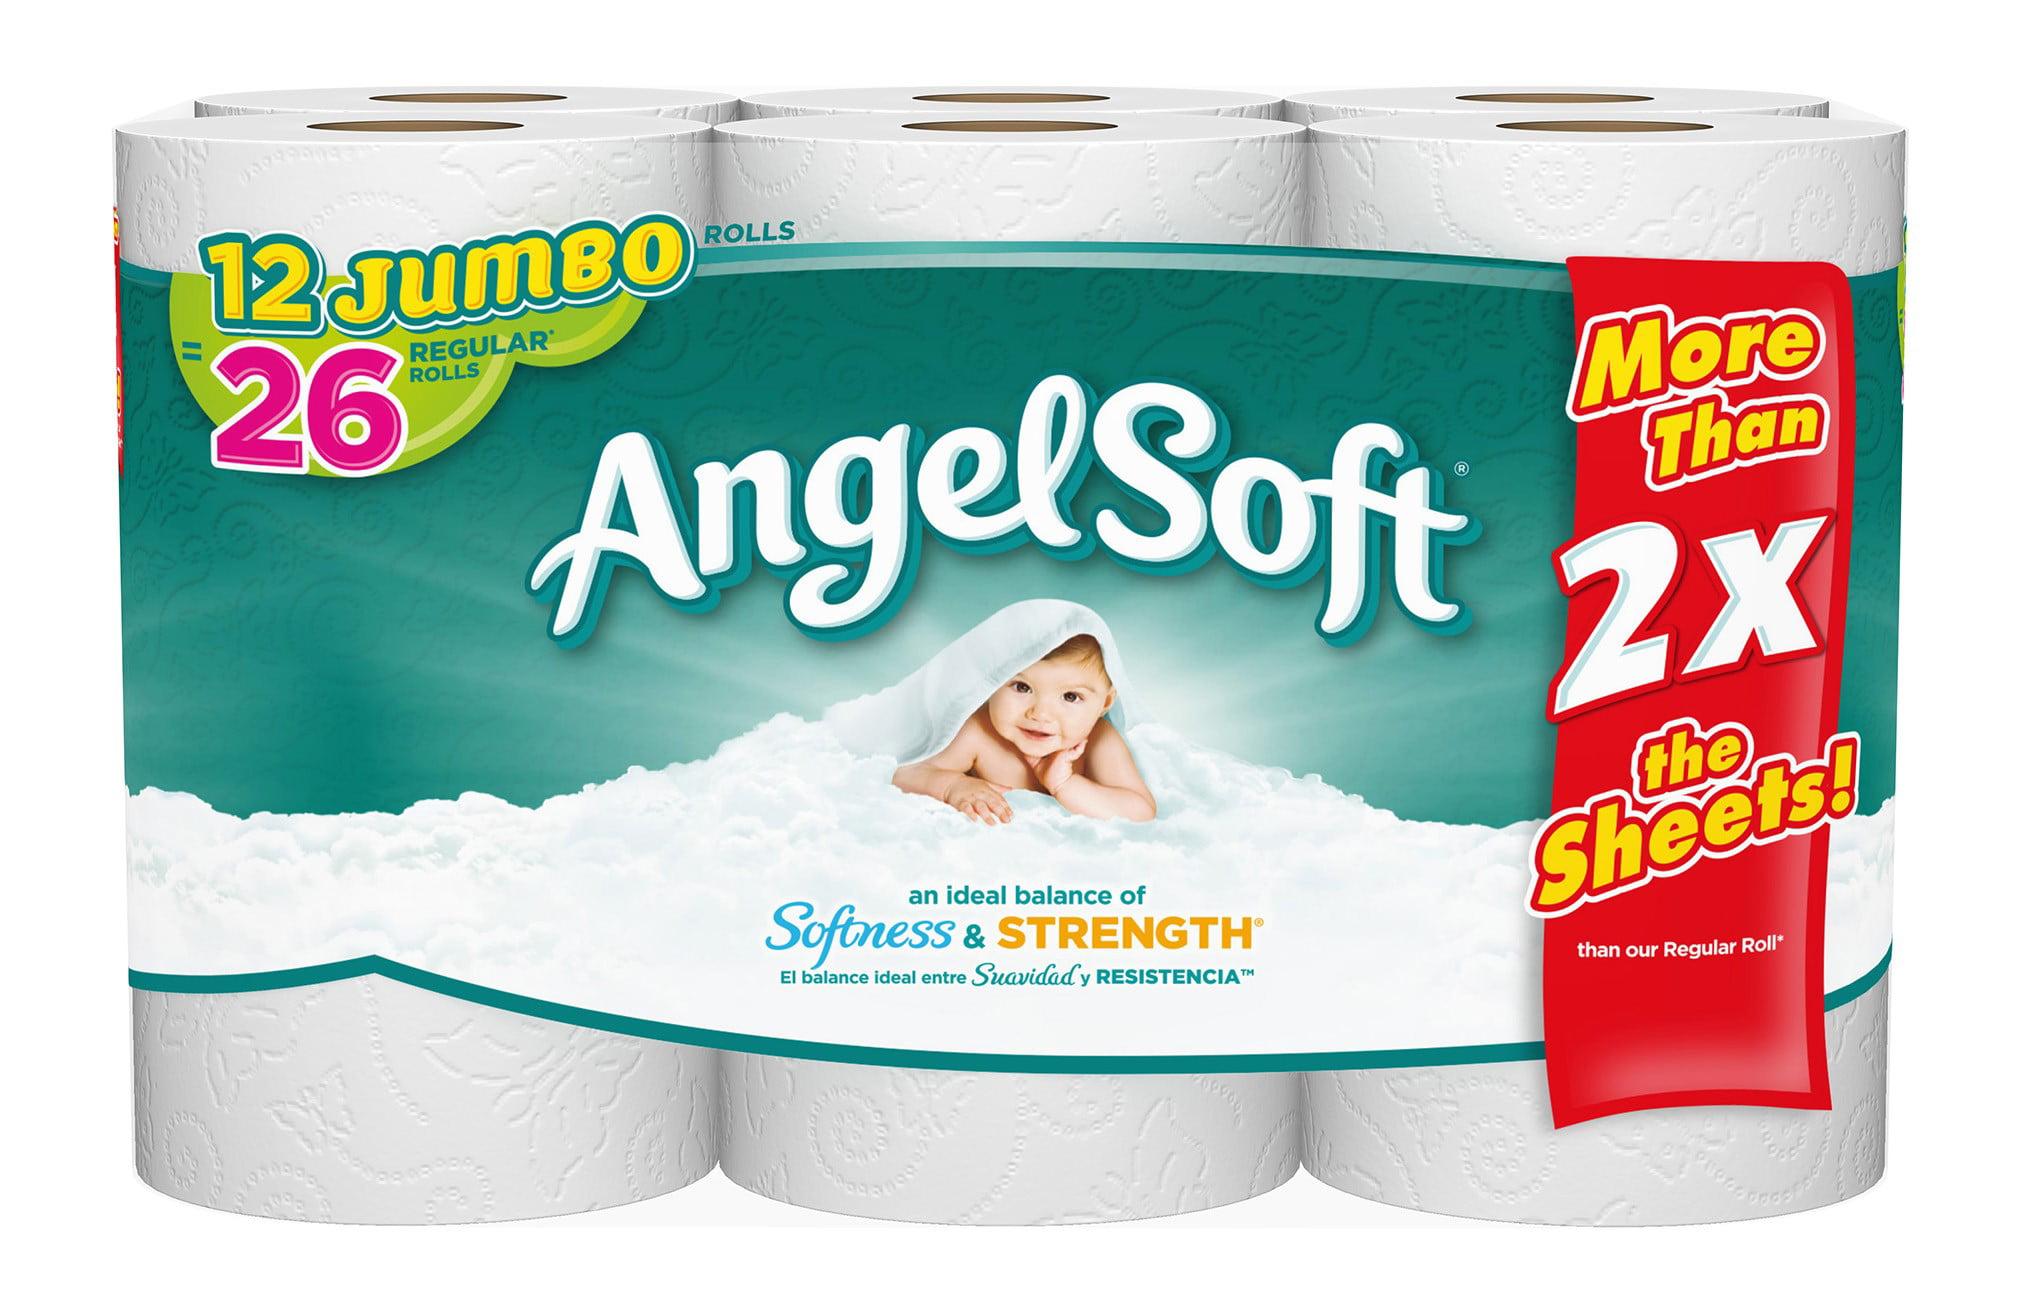 Angel Soft Toilet Paper, 12 Jumbo Rolls by Georgia Pacific